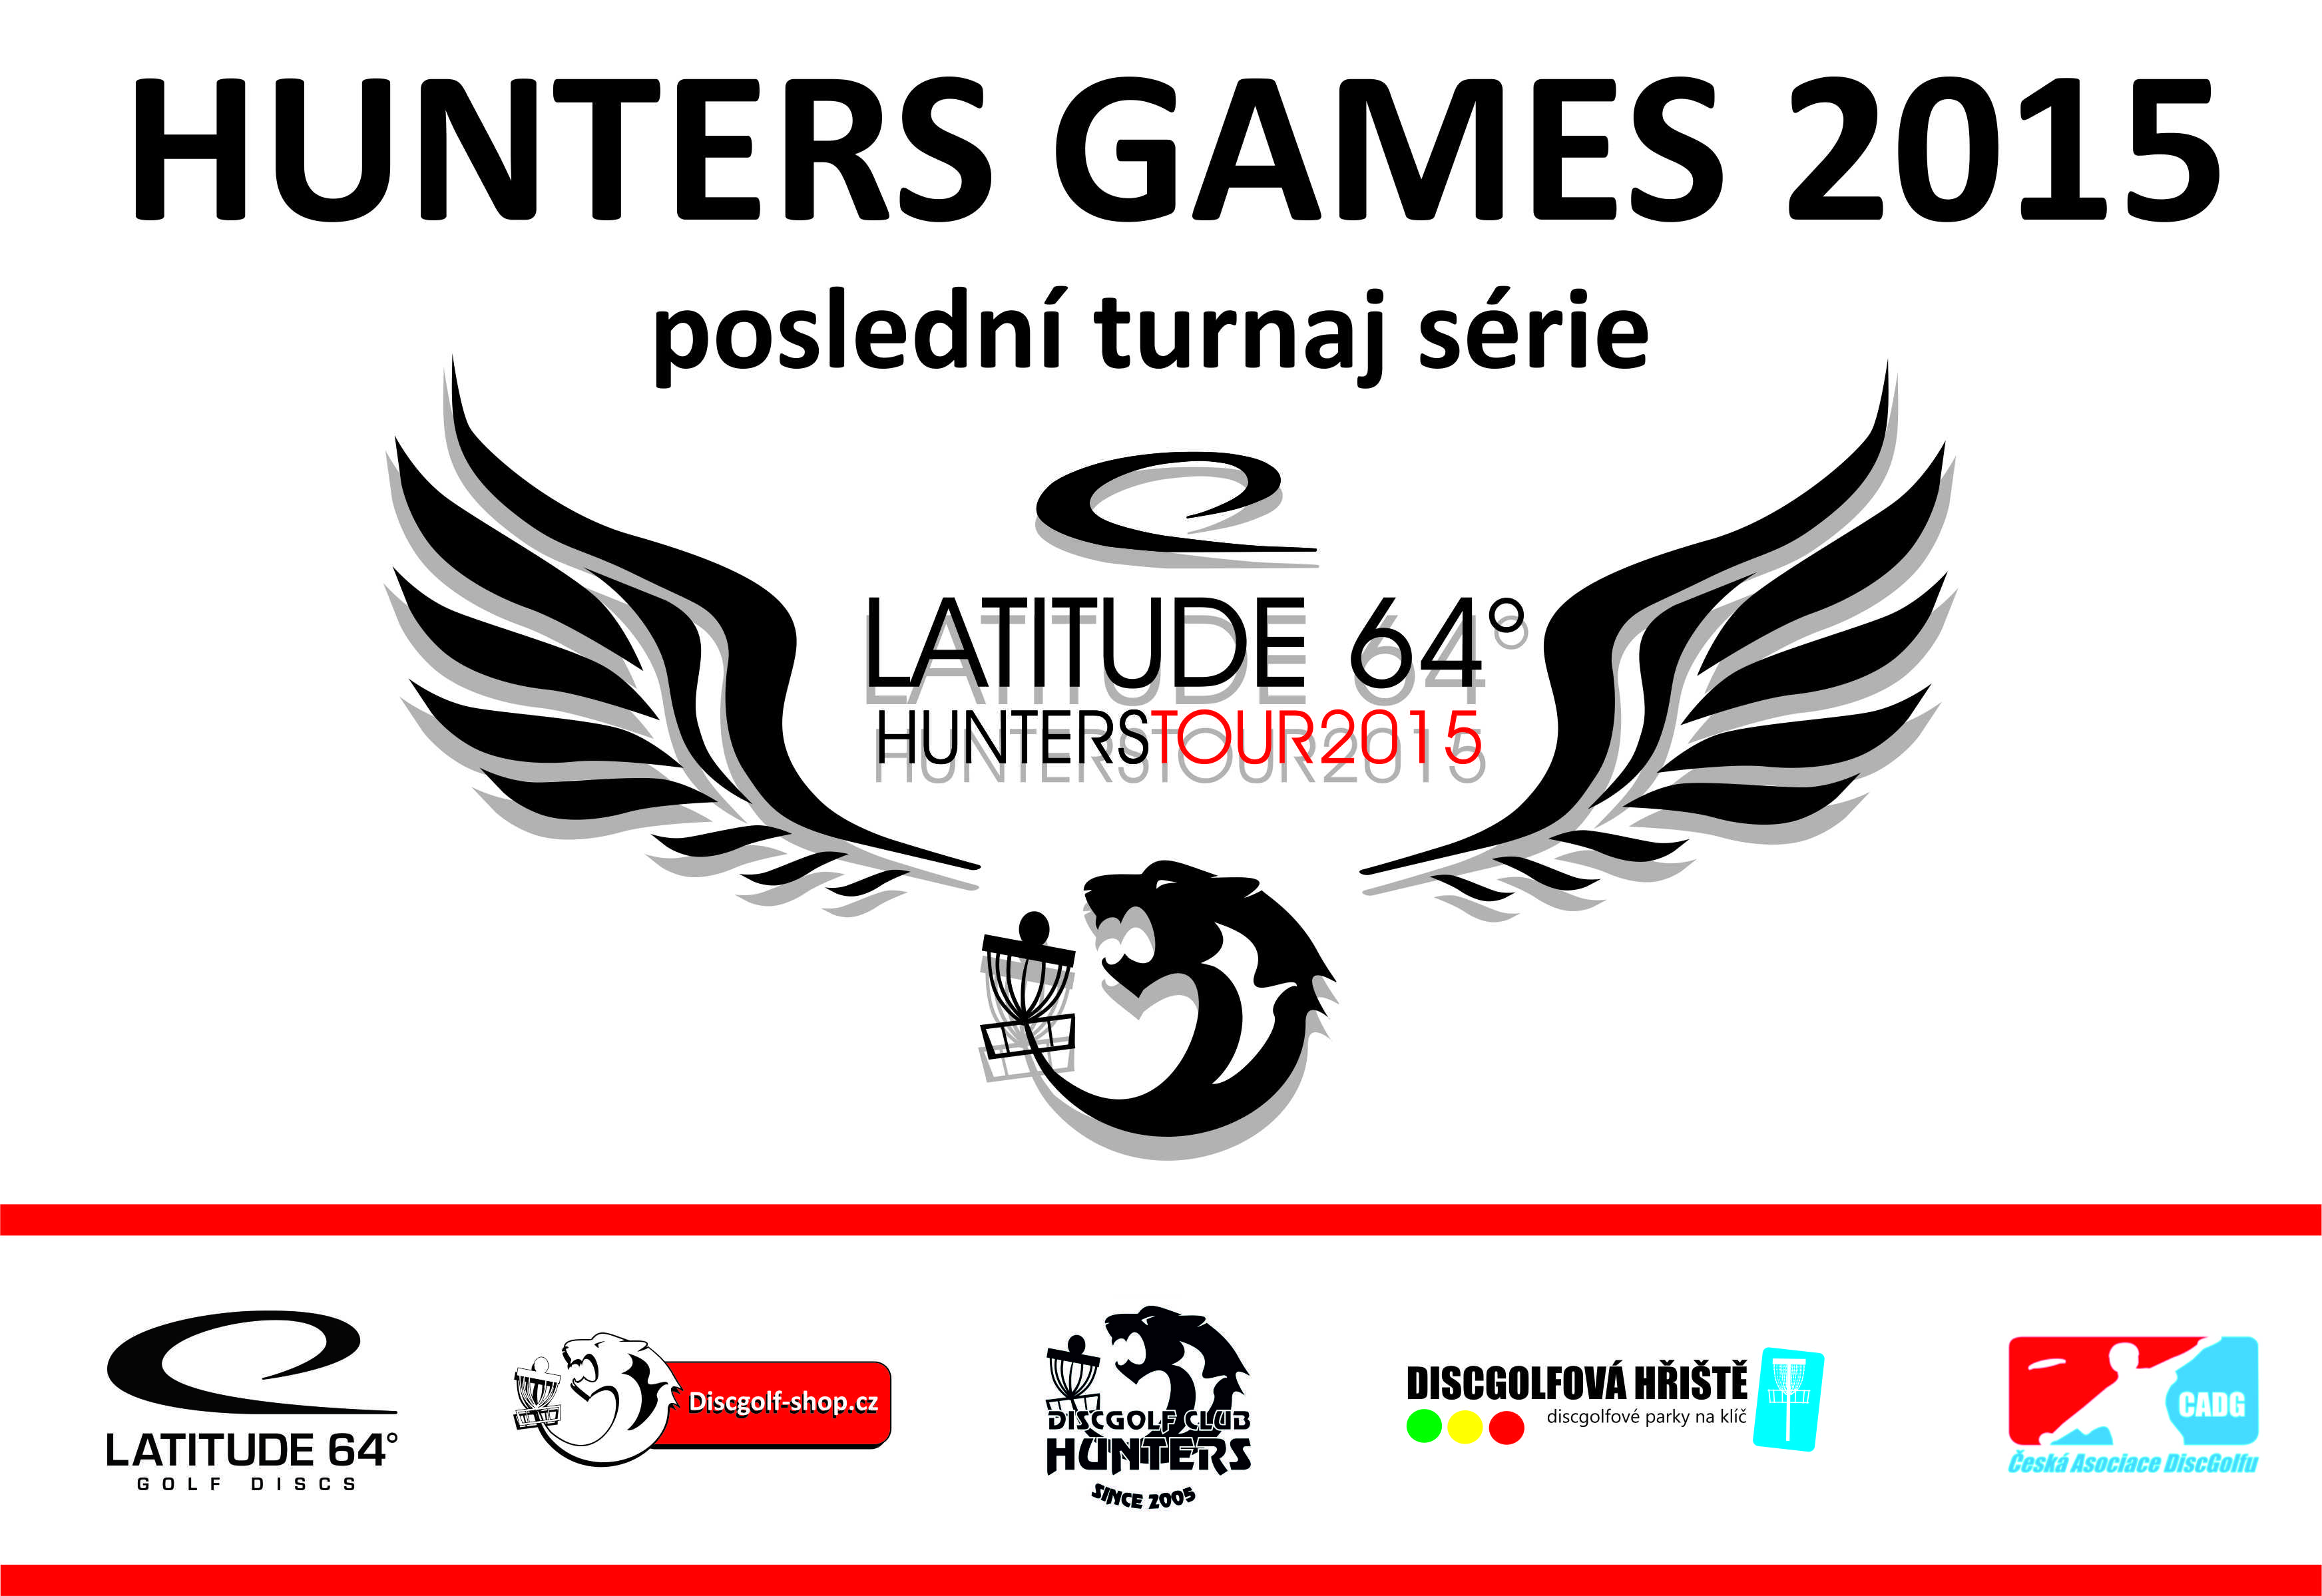 Hunters Games 2015